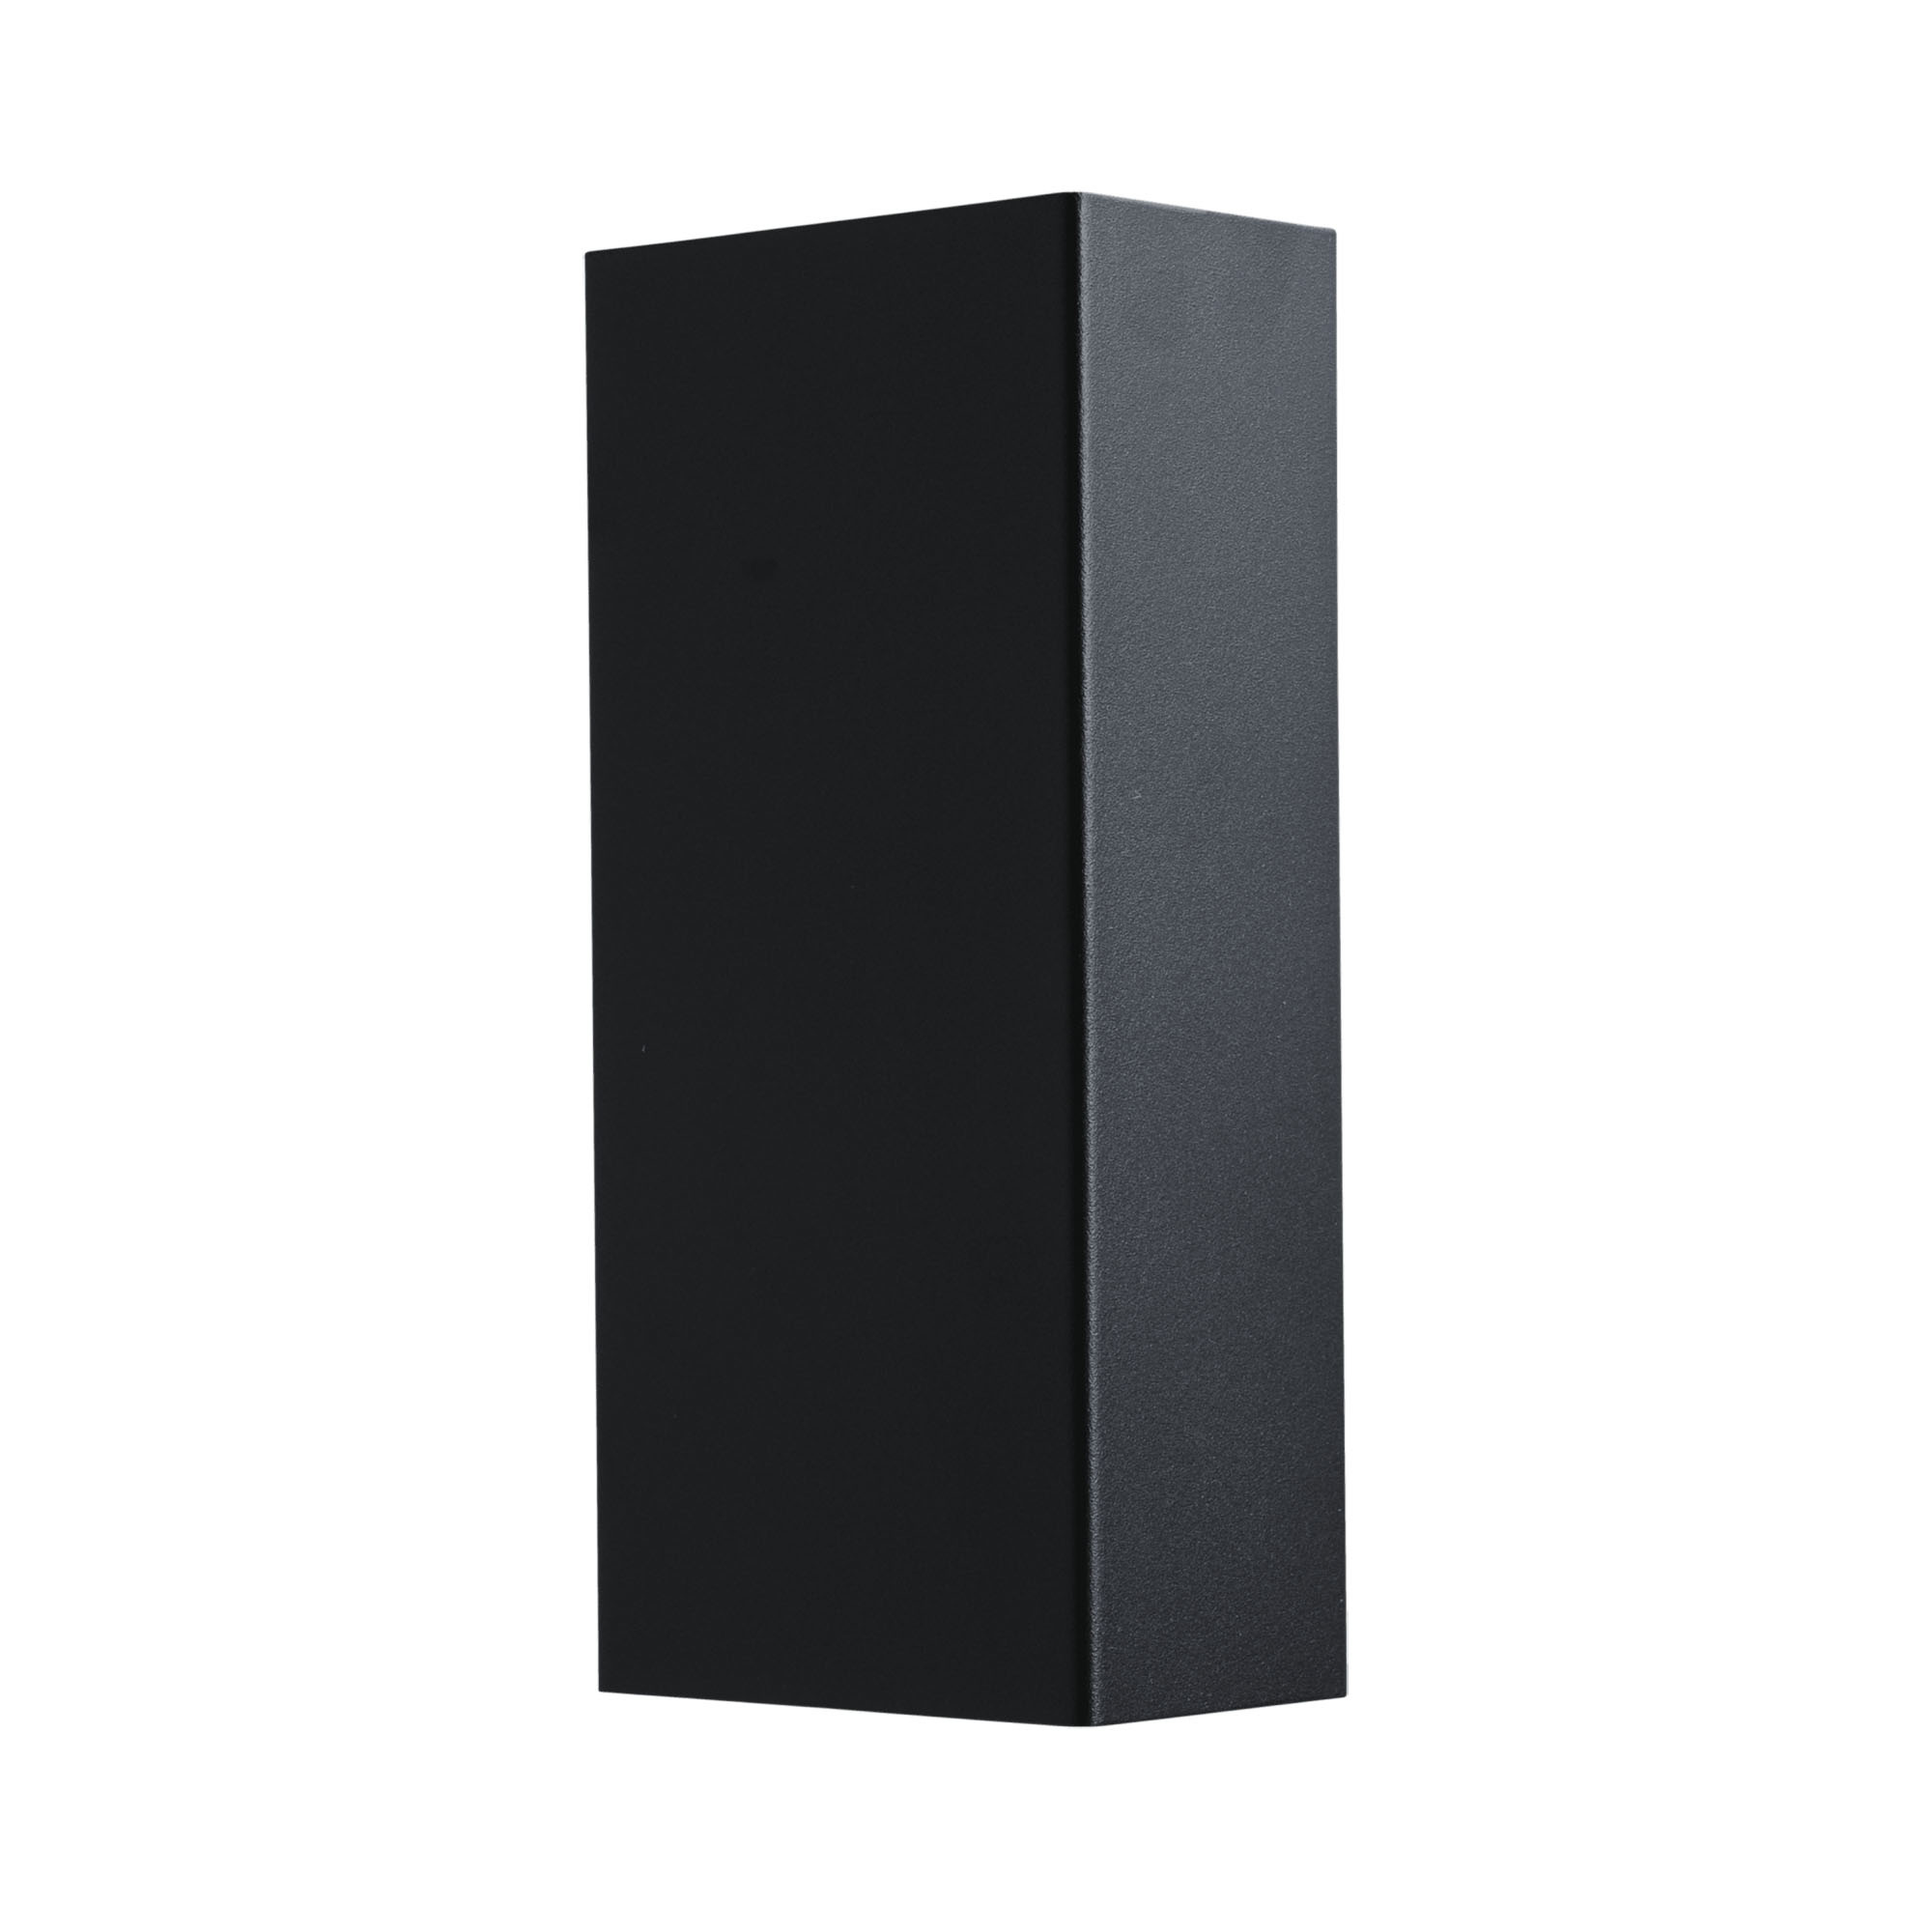 Masterlight Wandlamp Metallico H 22 cm B 10 cm zwart